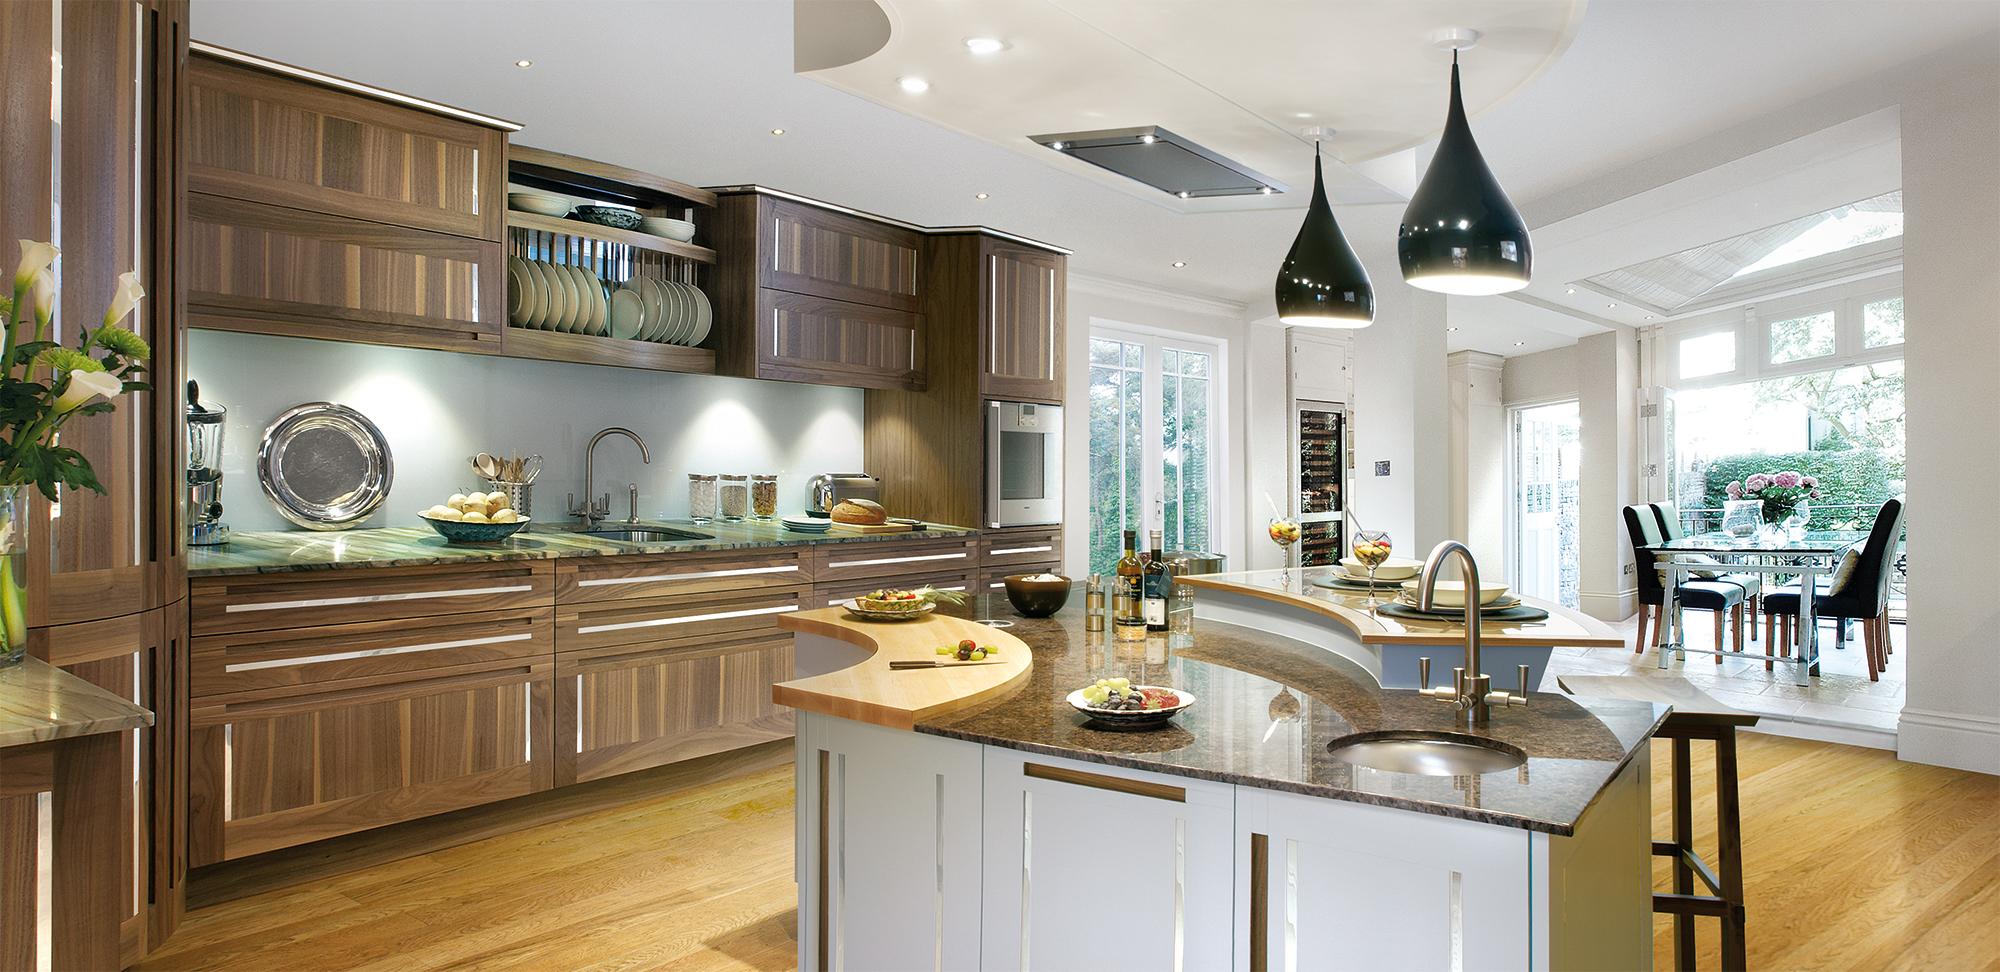 Mark wilkinson furniture collection newlyn kitchen 6